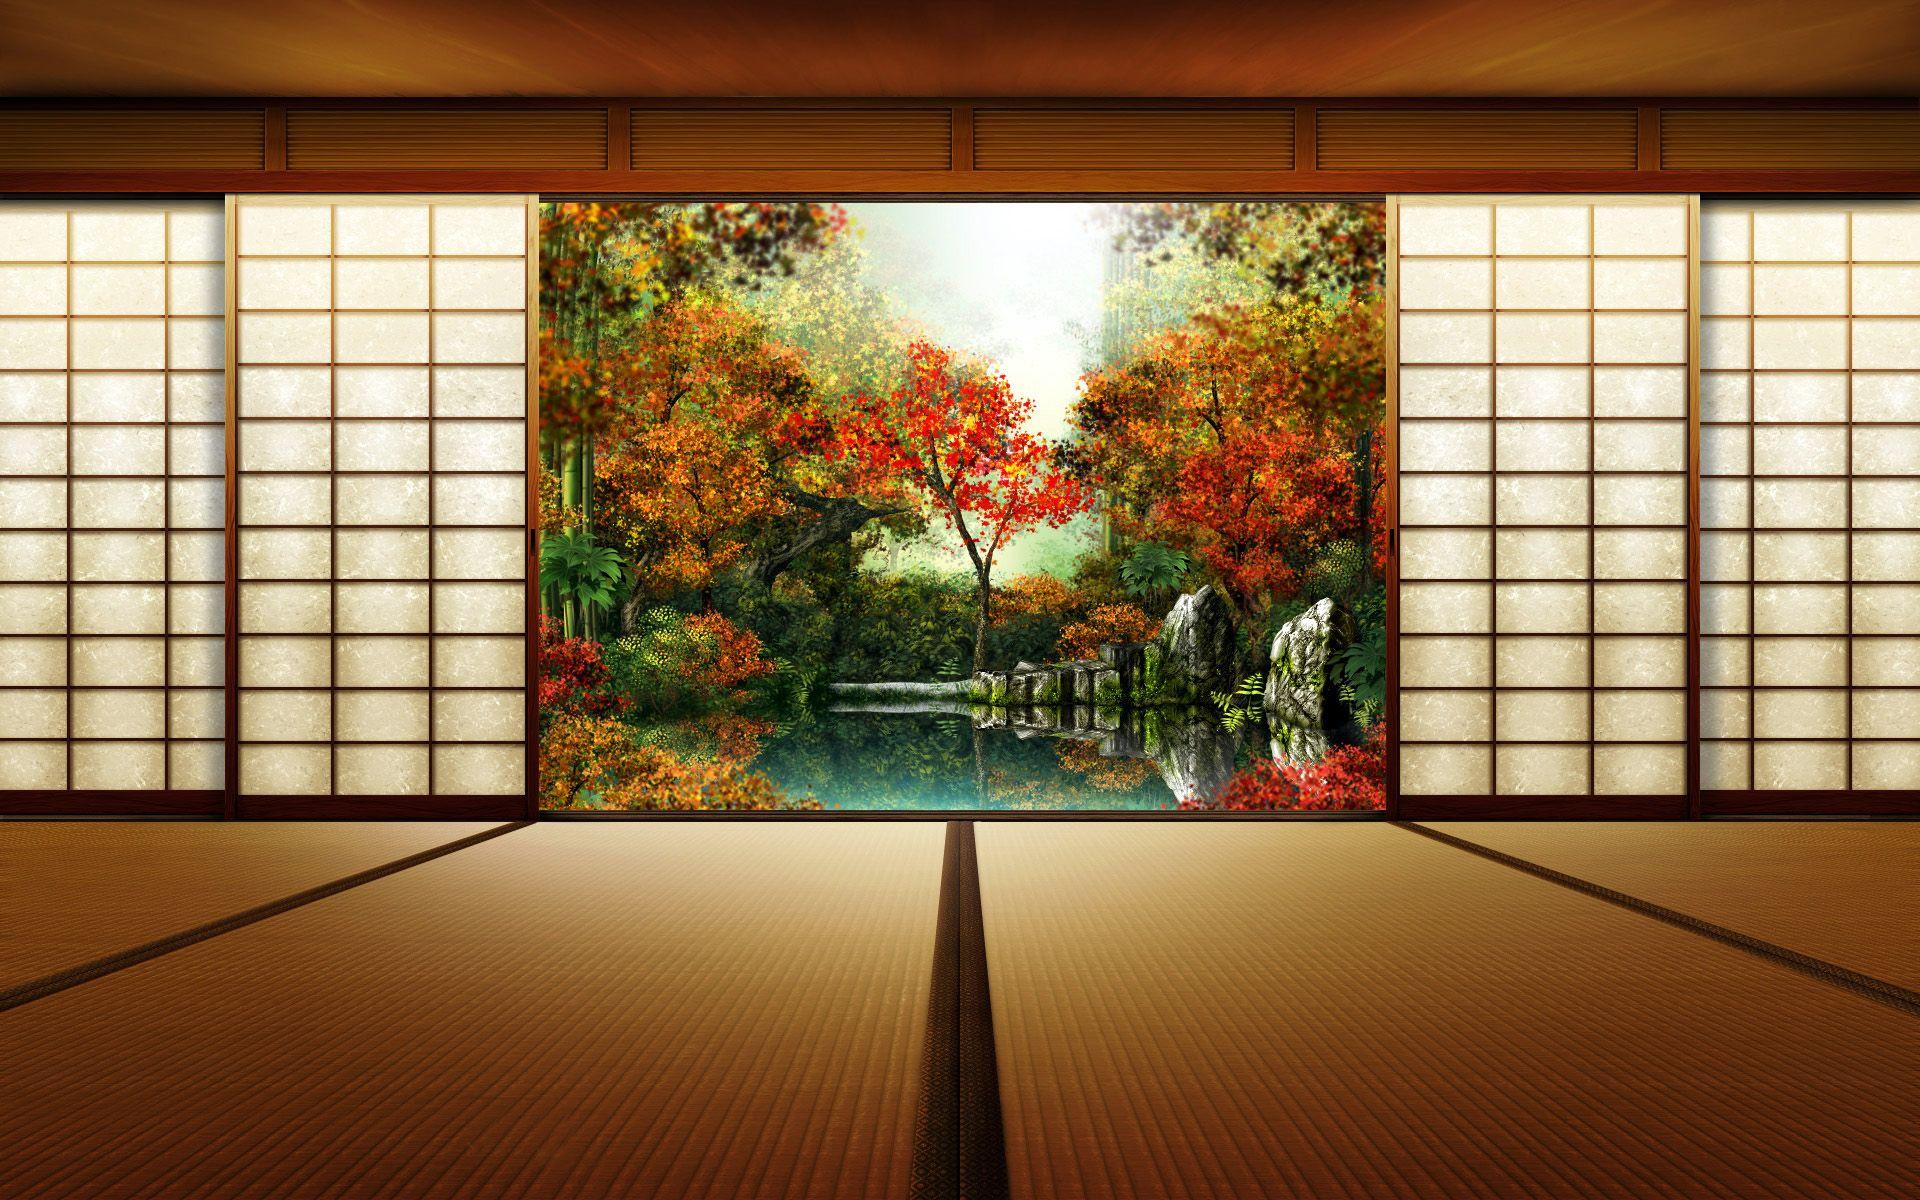 desktop backgrounds a· japanese garden anime